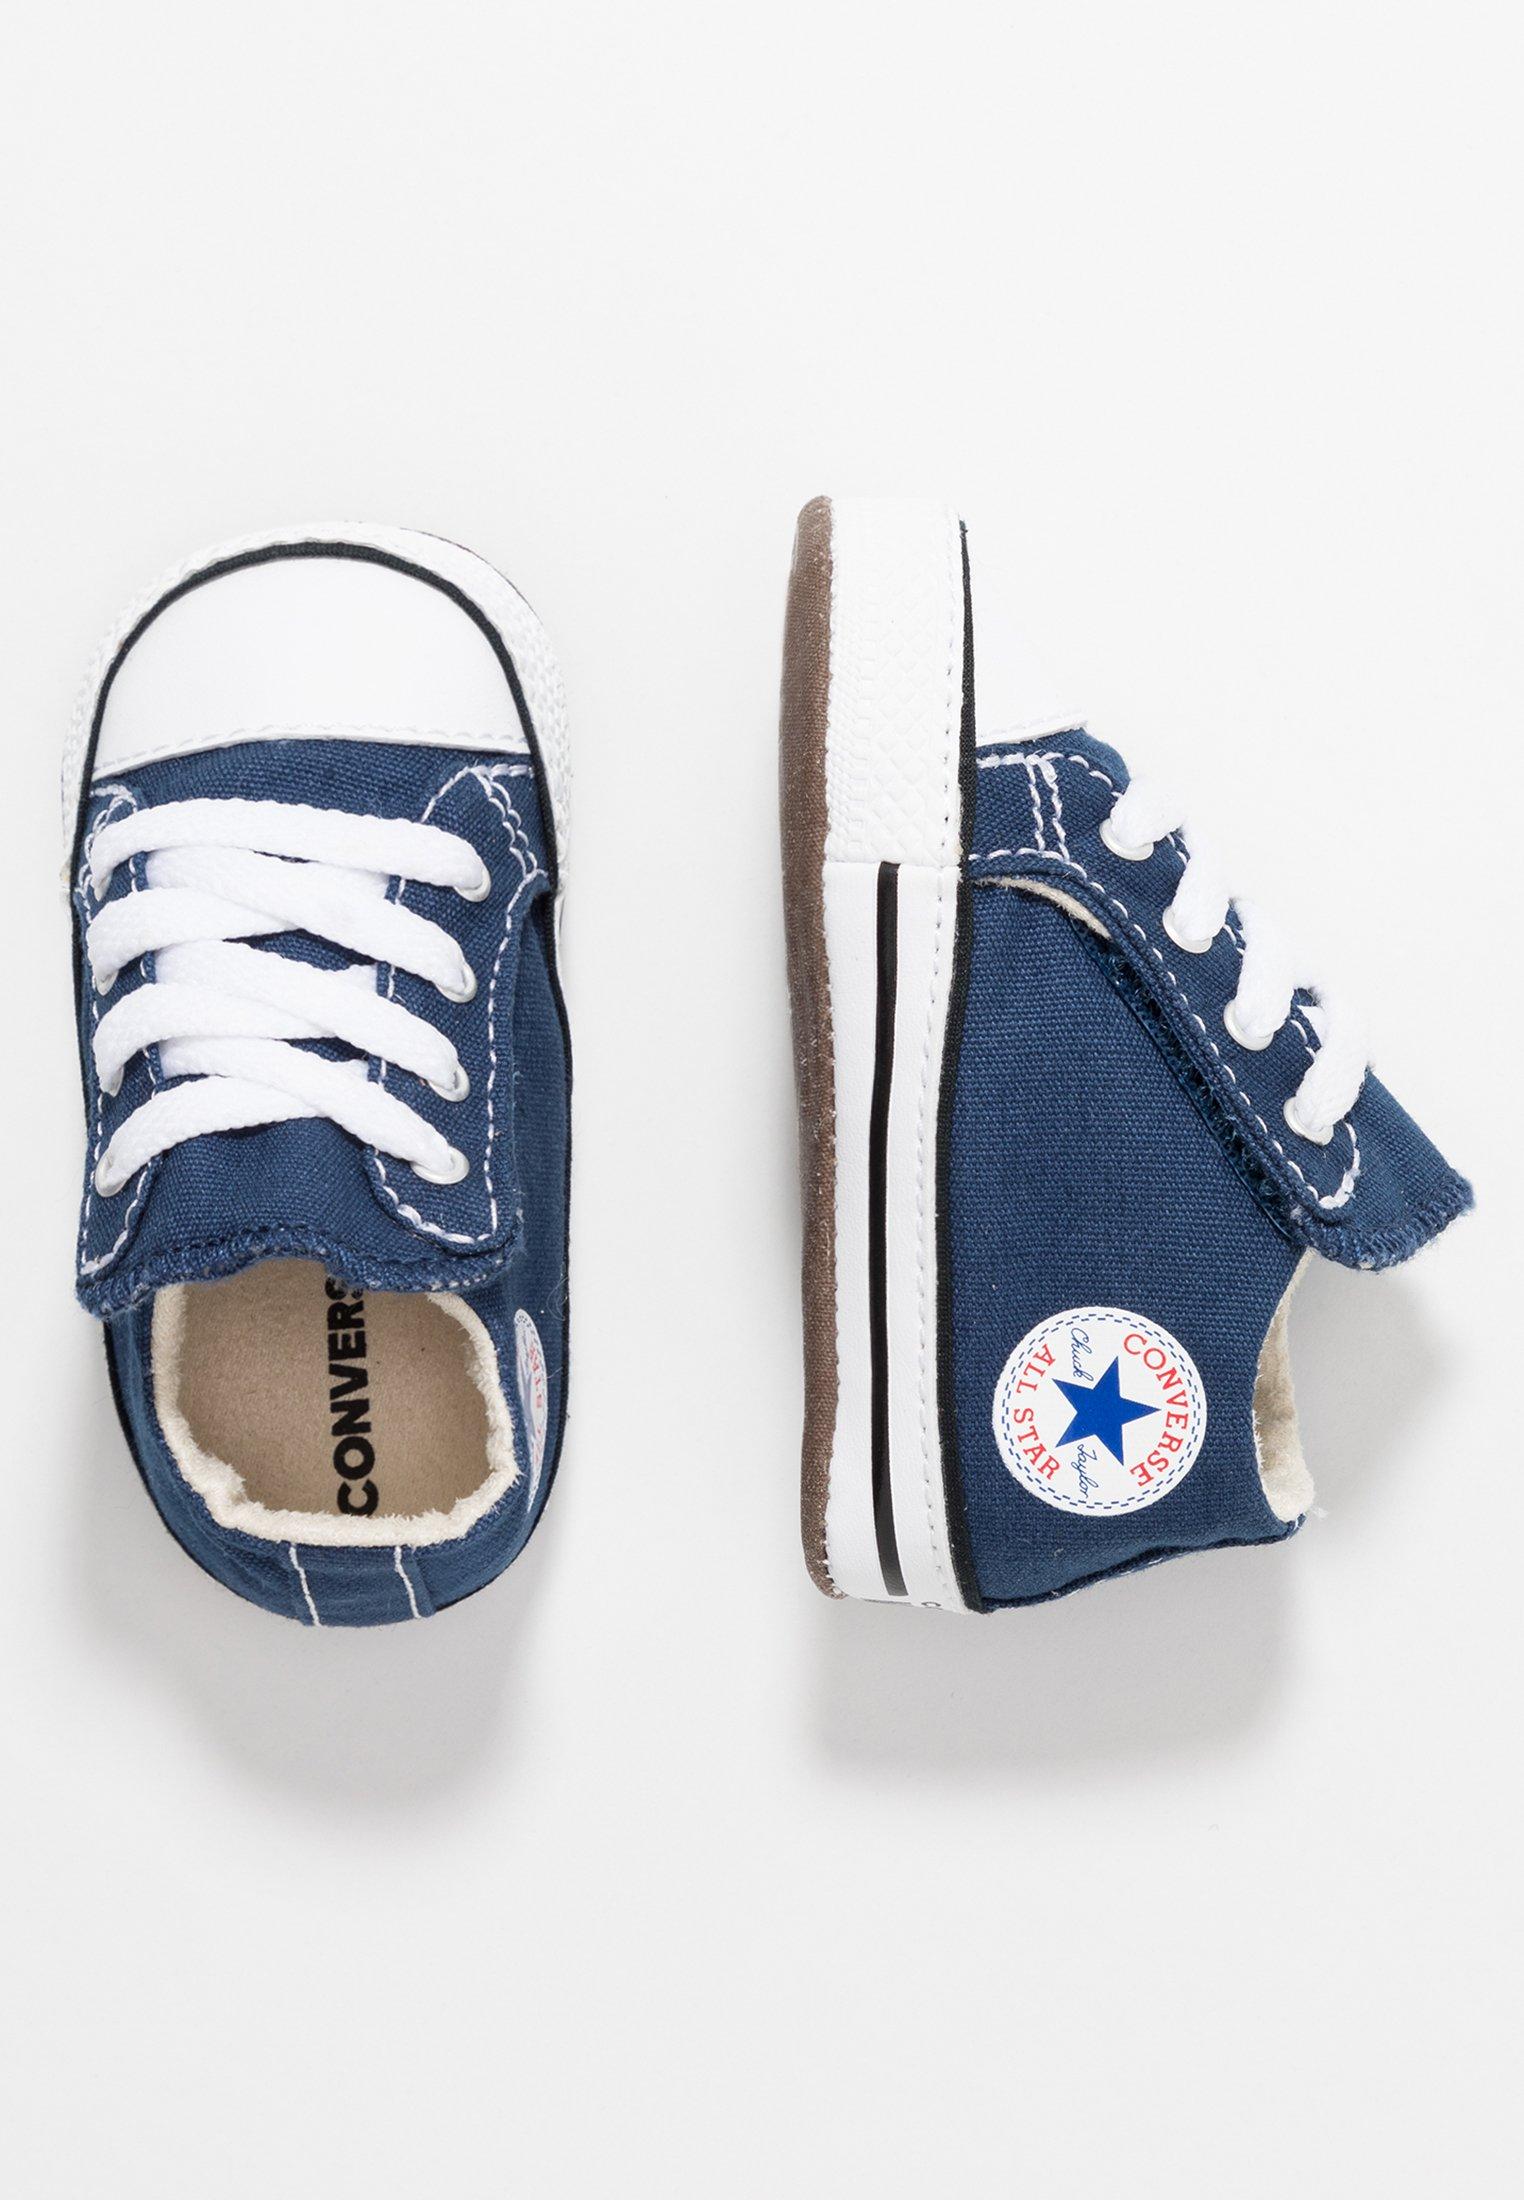 Bottines Chaussures bébé fille Chaussures bébé Converse Star